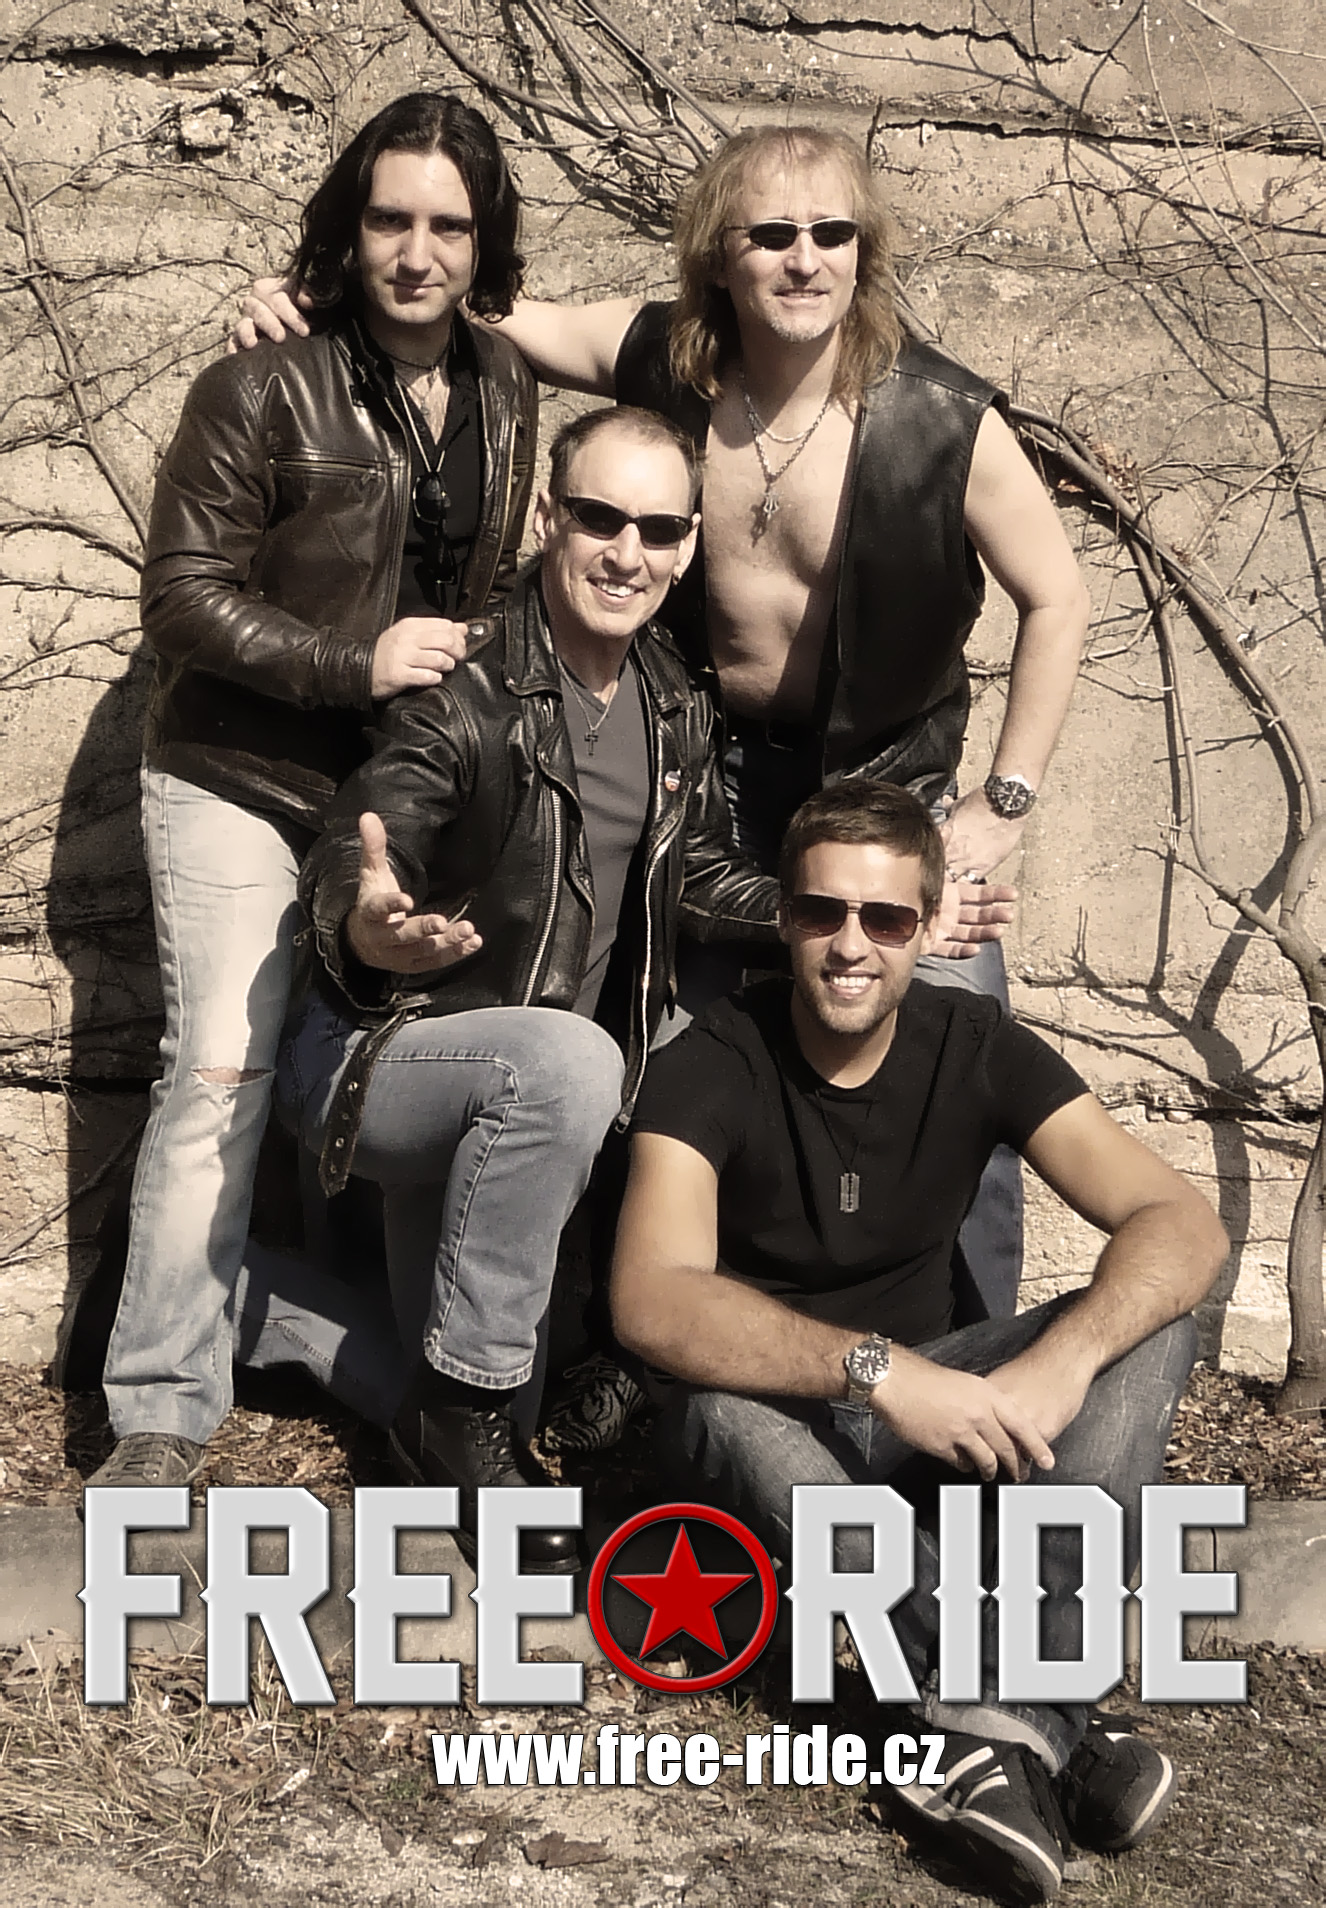 freeride-promotional